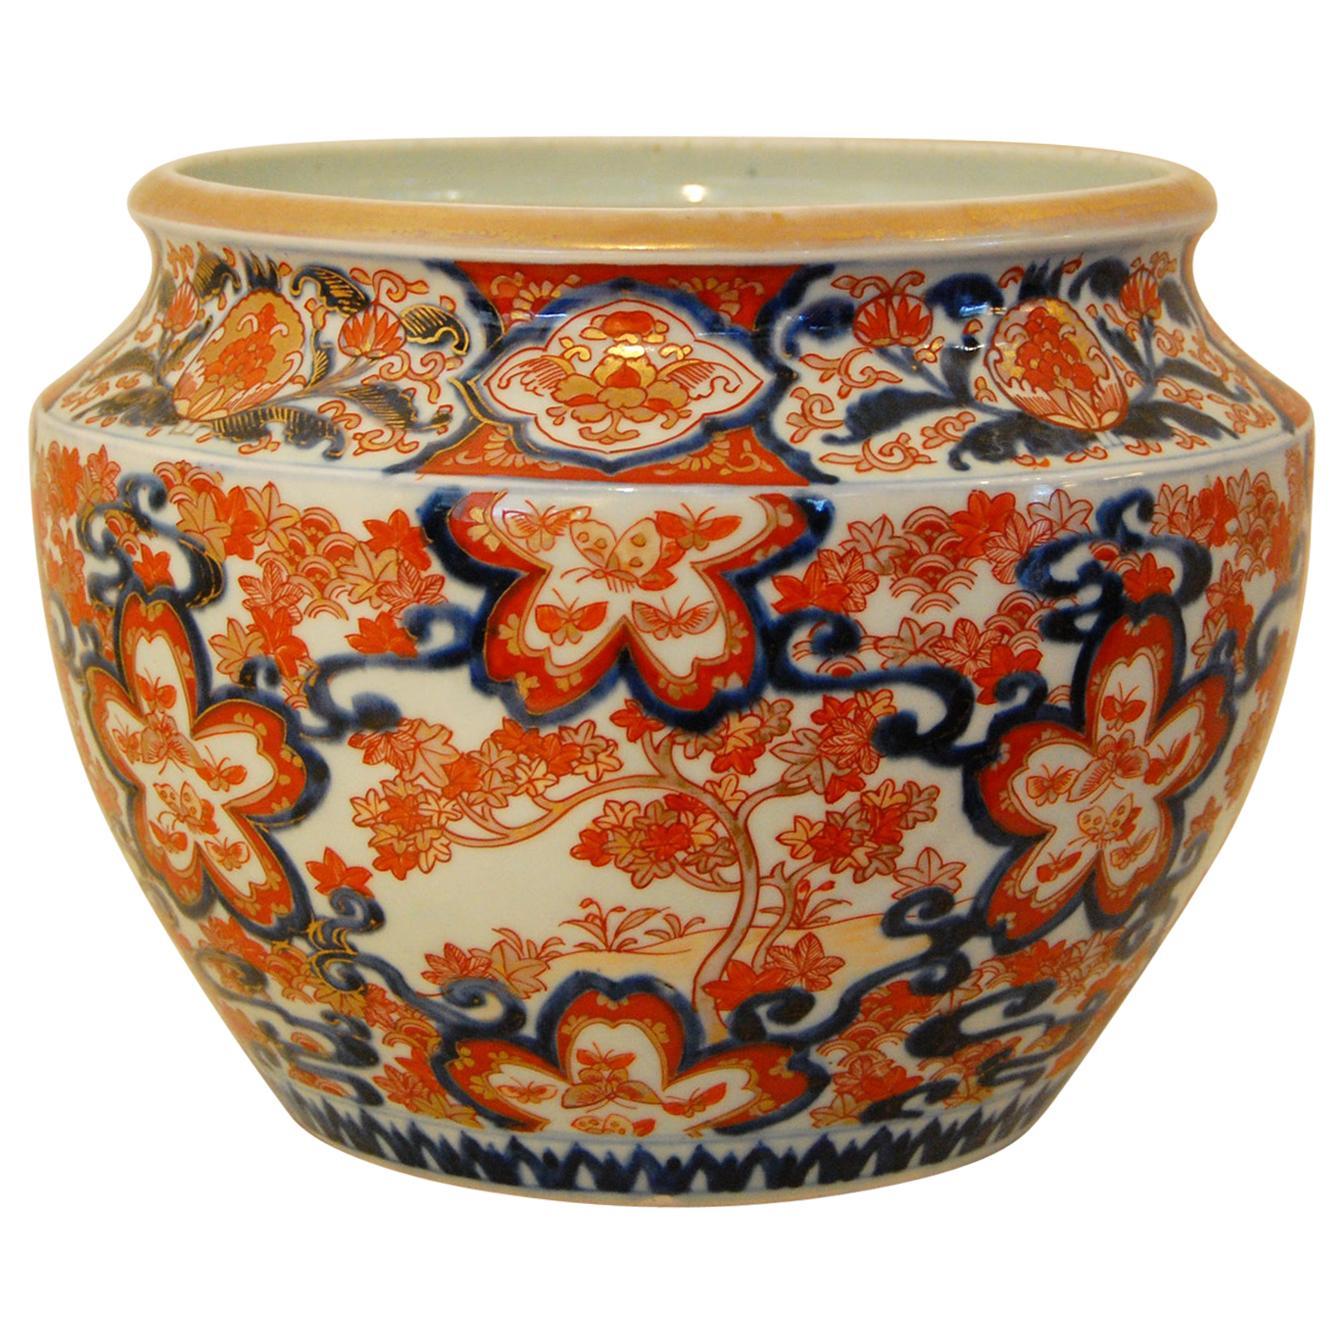 Japanese Meiji Period Imari Jardinière